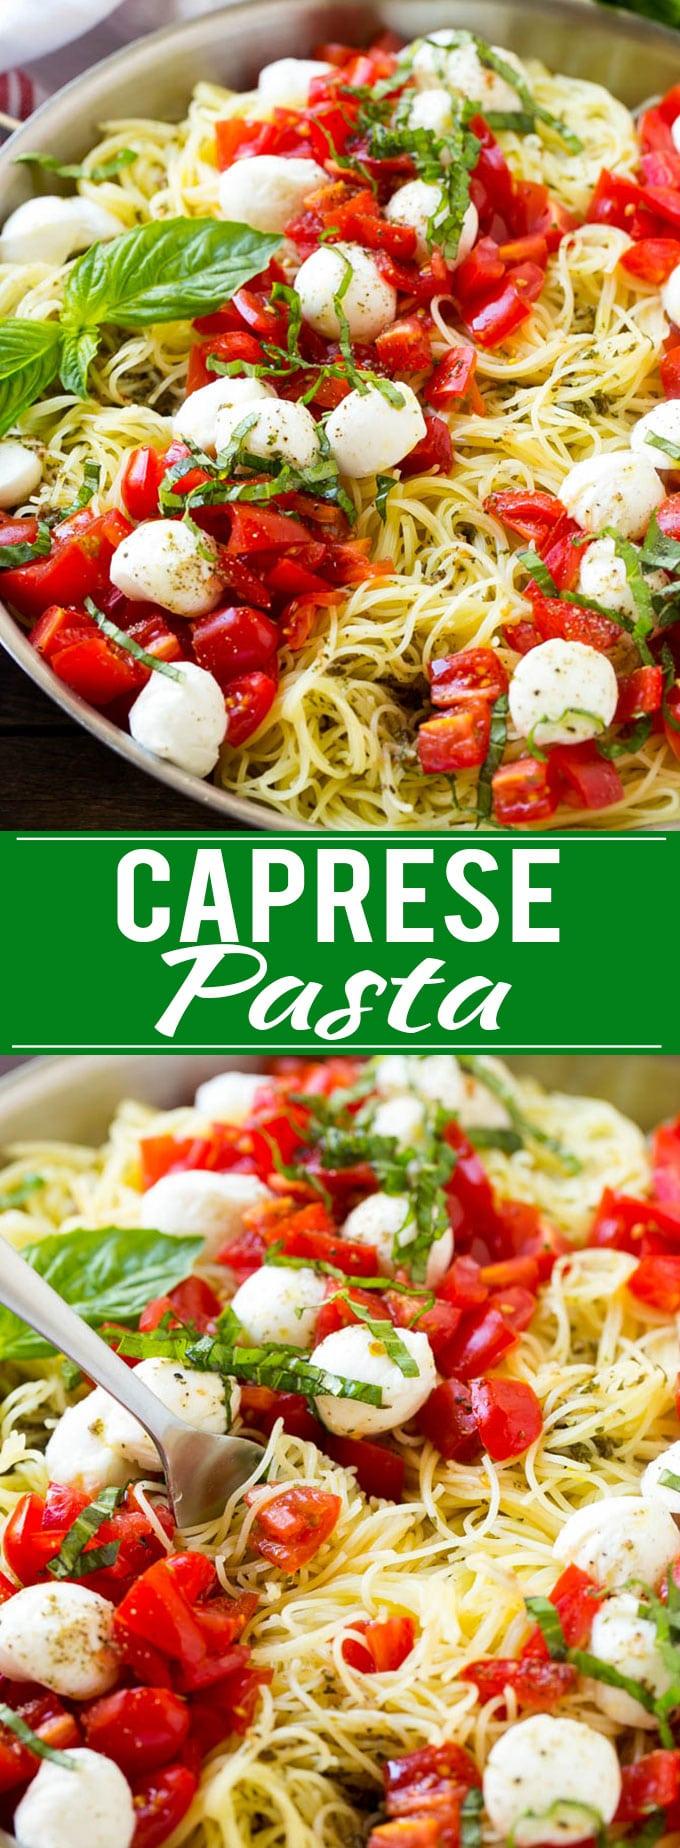 Caprese Pasta Recipe | Easy Pasta Recipe | Fresh Tomato Pasta | Caprese Recipe #caprese #pasta #tomato #dinner #dinneratthezoo